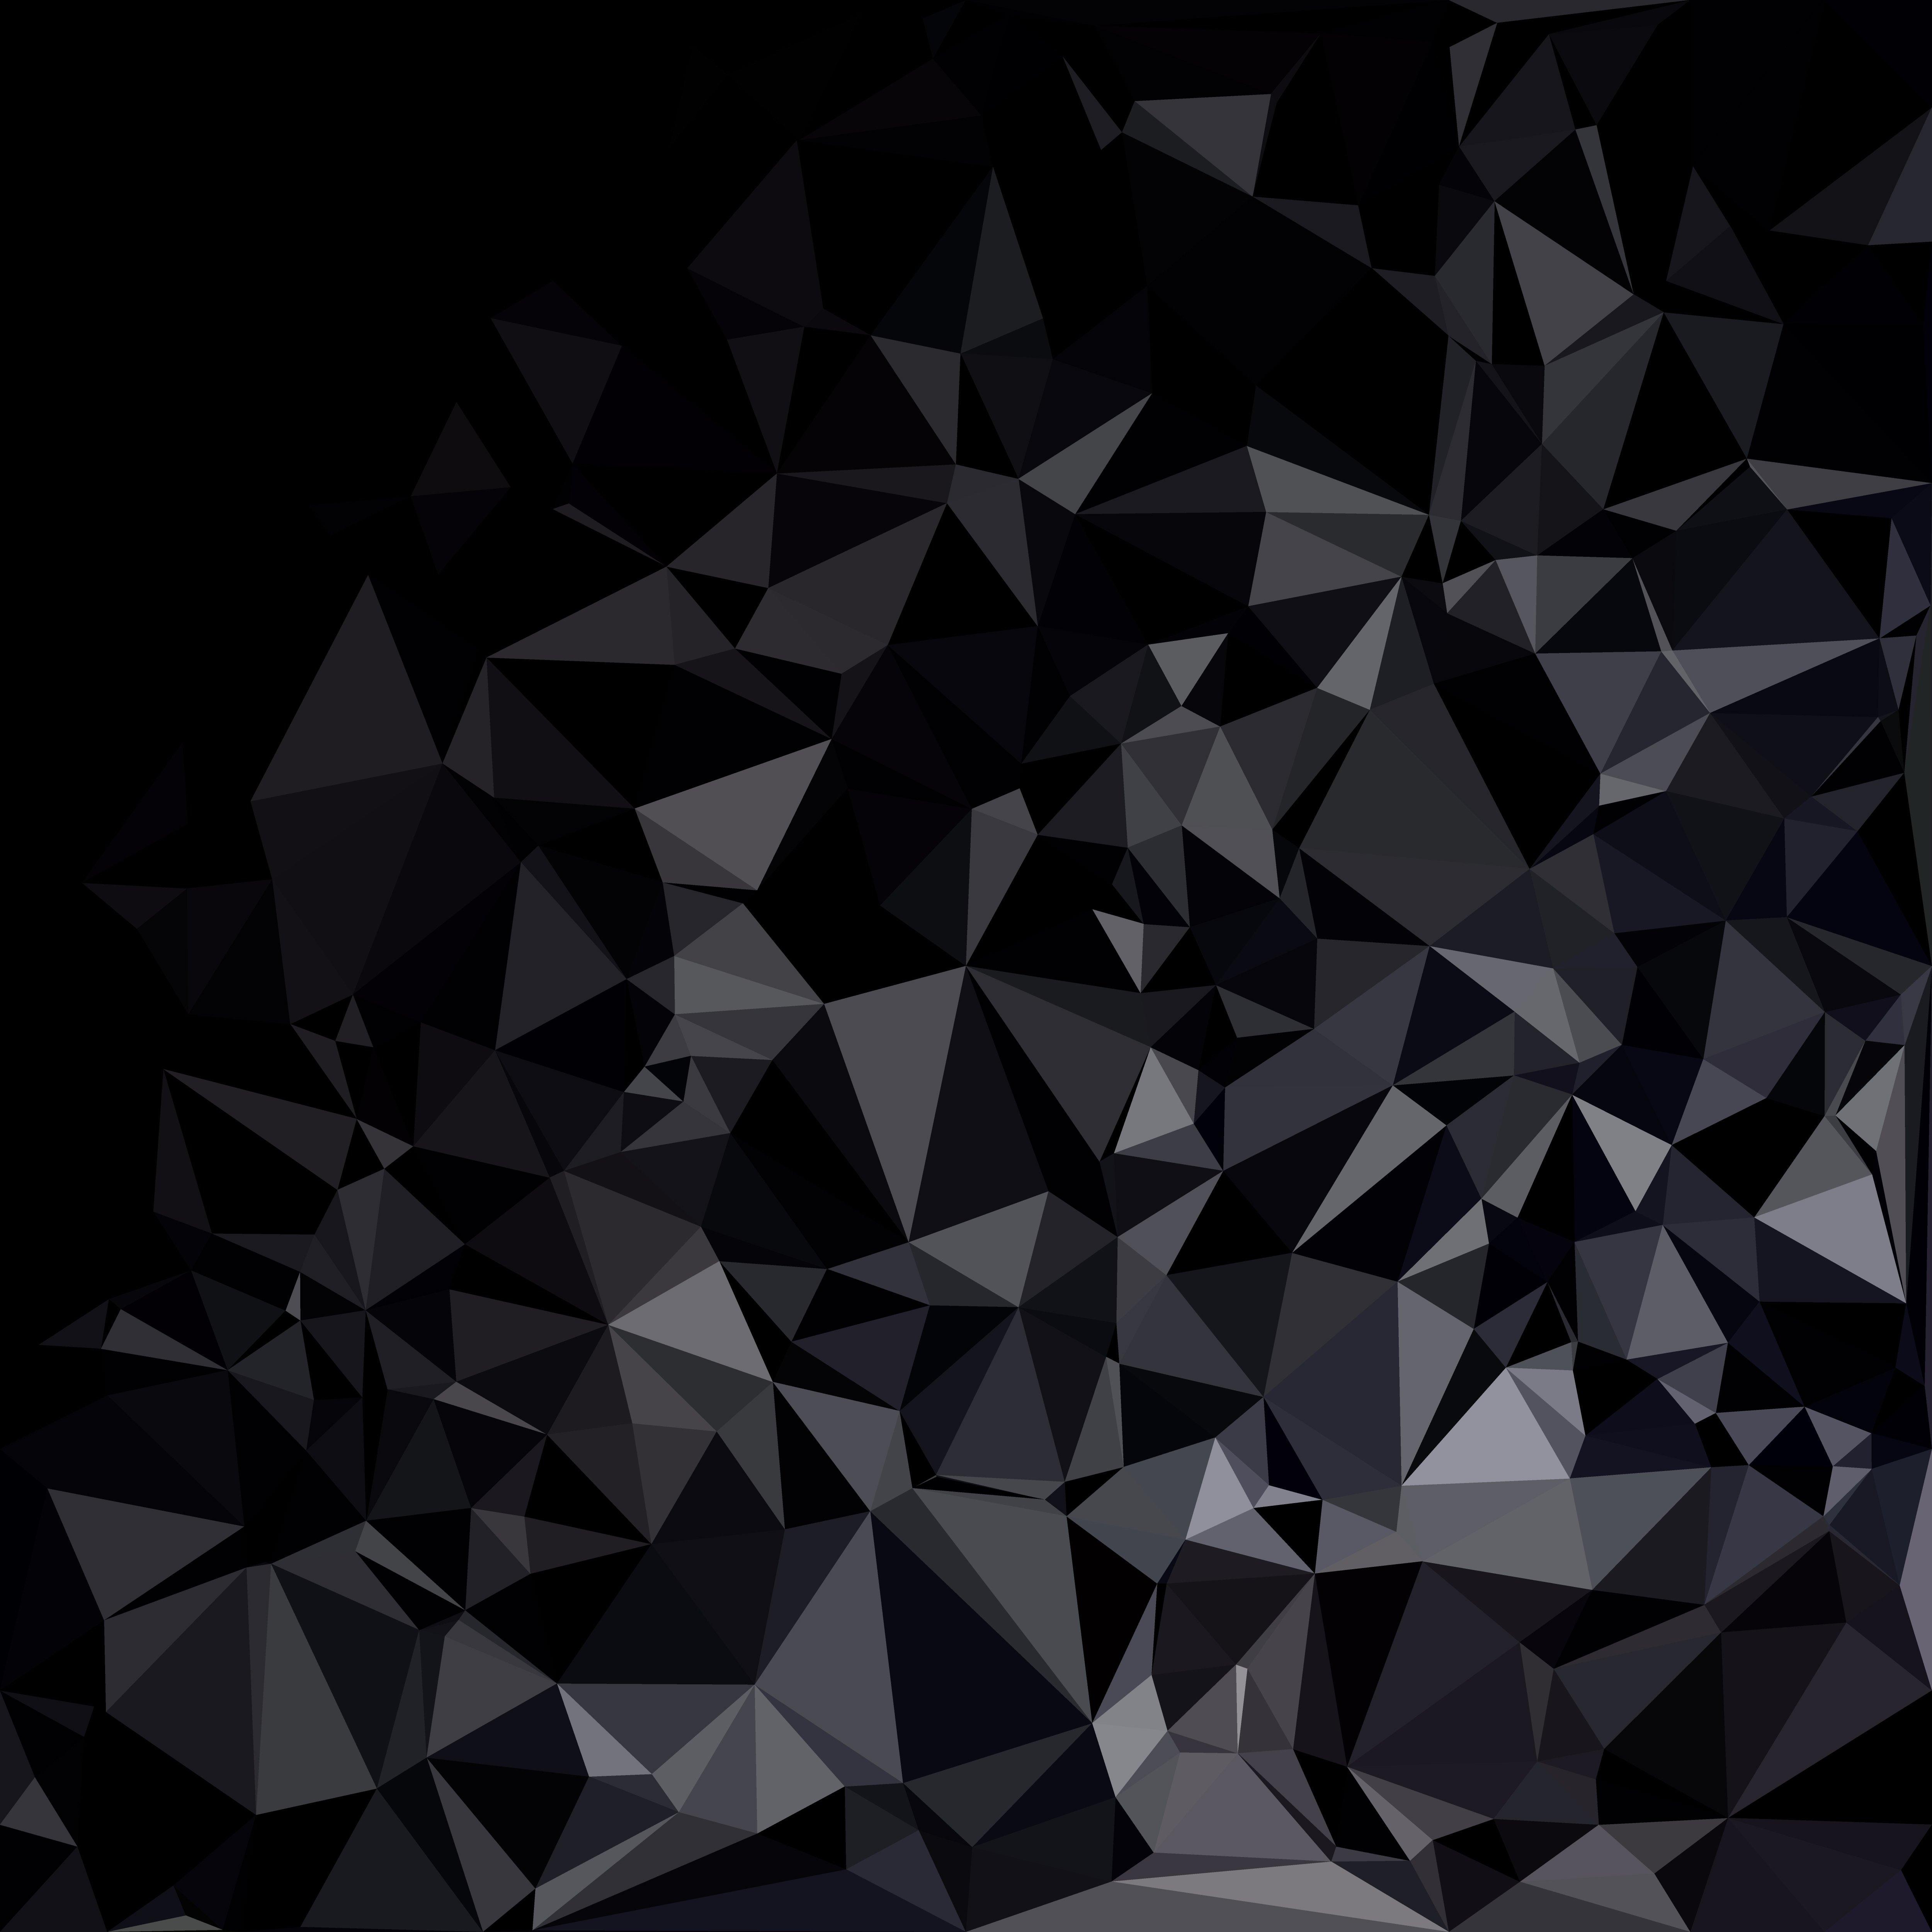 Black Vector Design